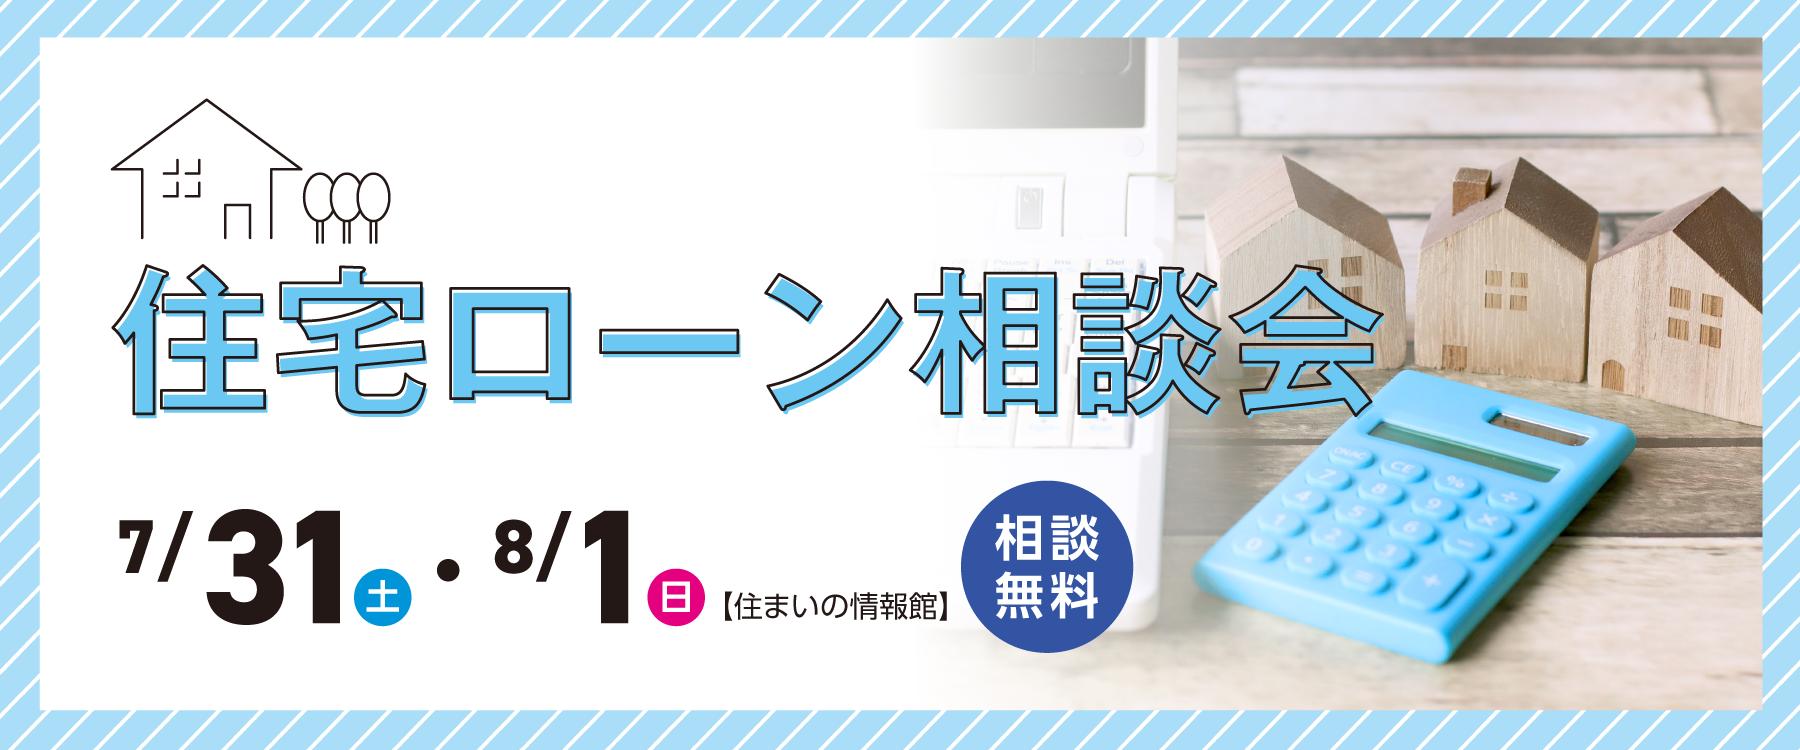 画像:7月31日(土)、8月1日(日)住宅ローン相談会